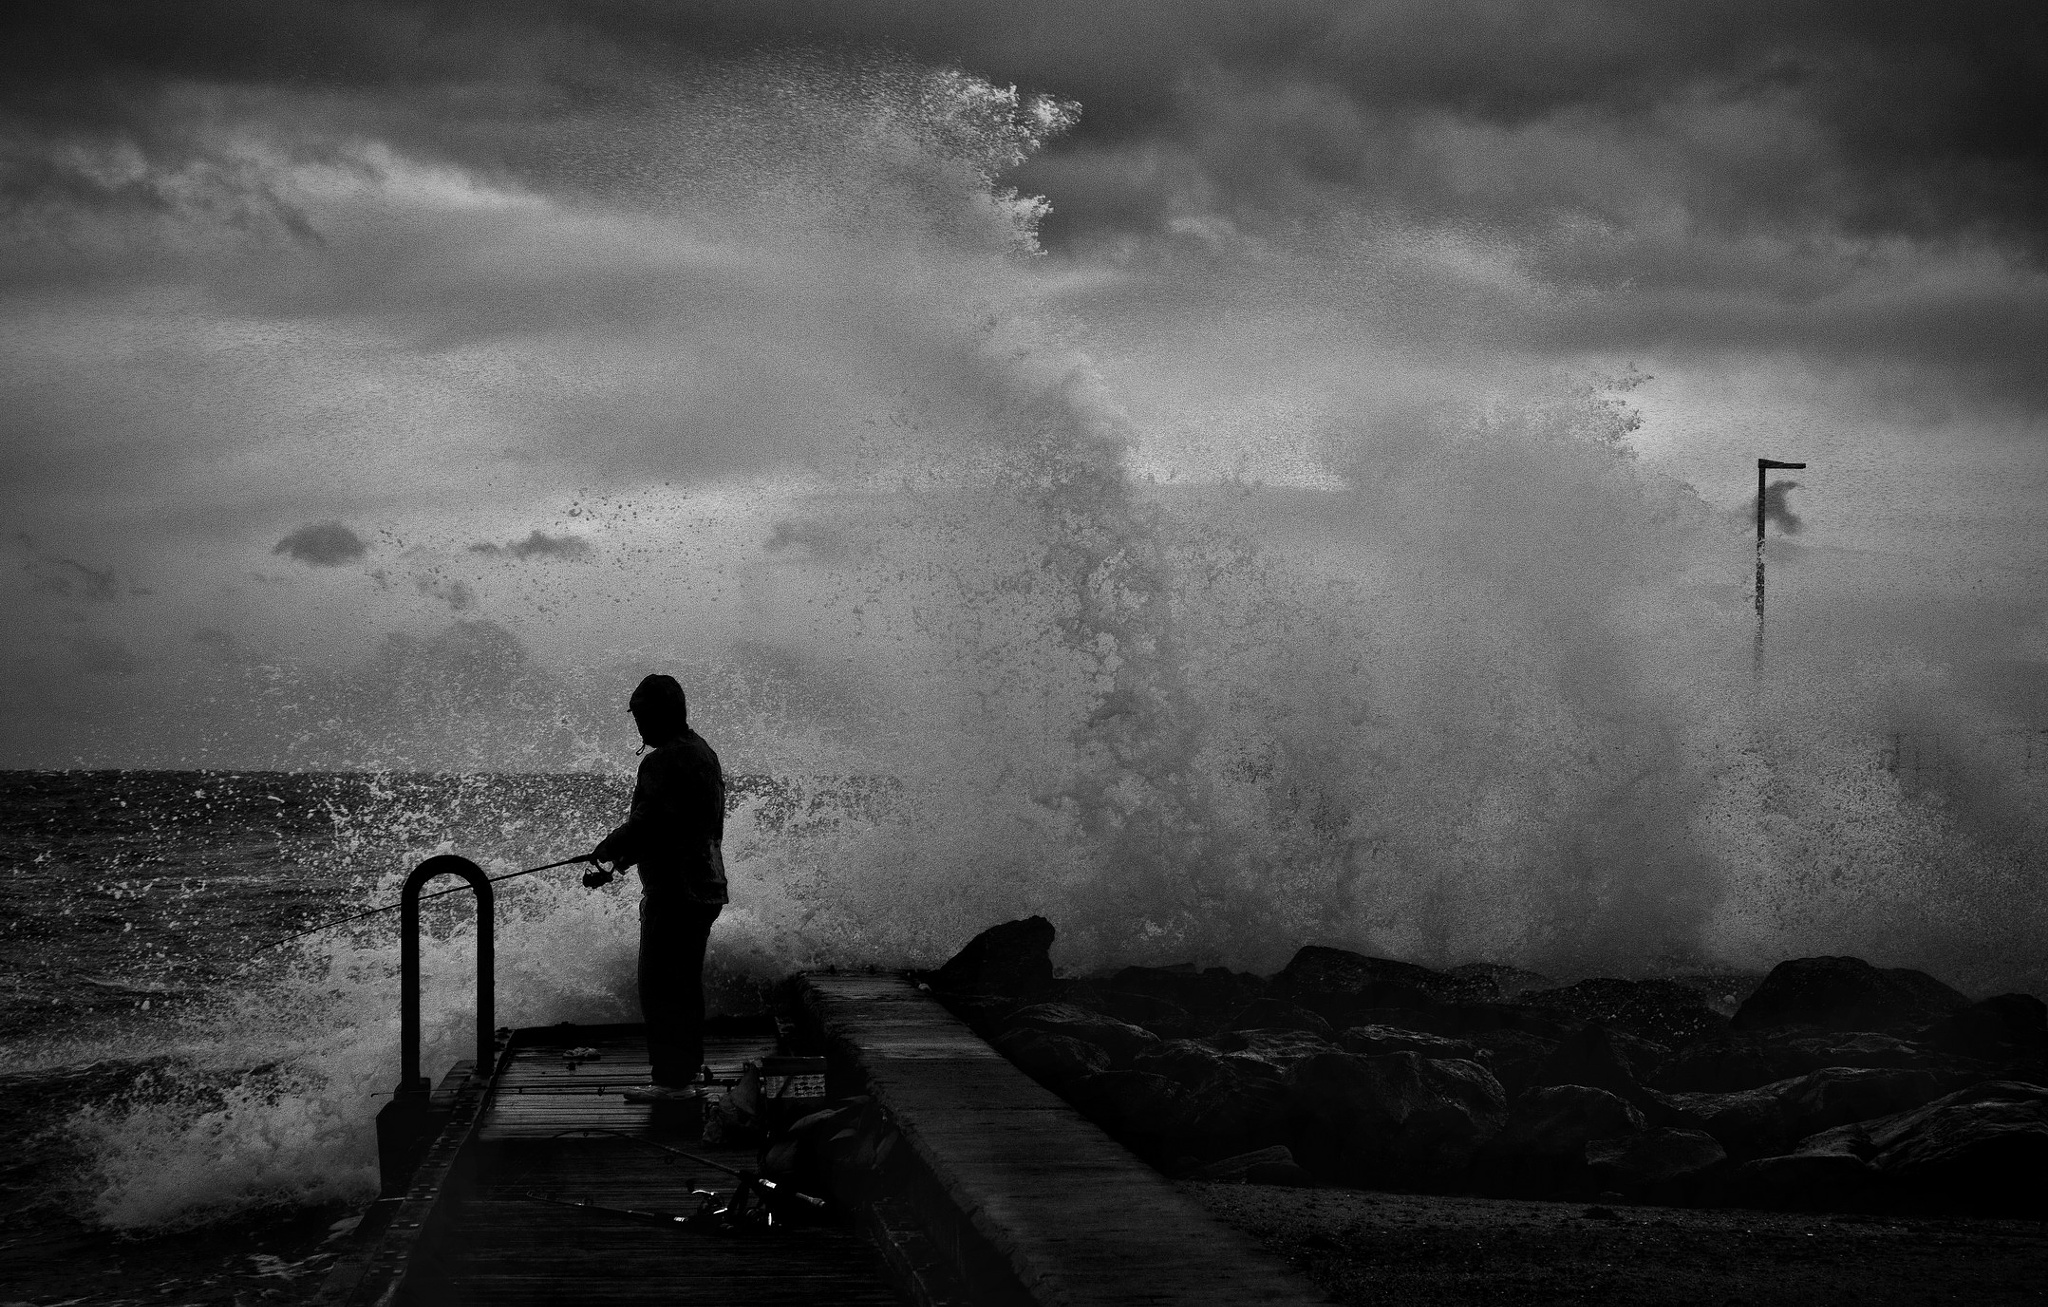 The Insane Fisherman by Mark Vivian